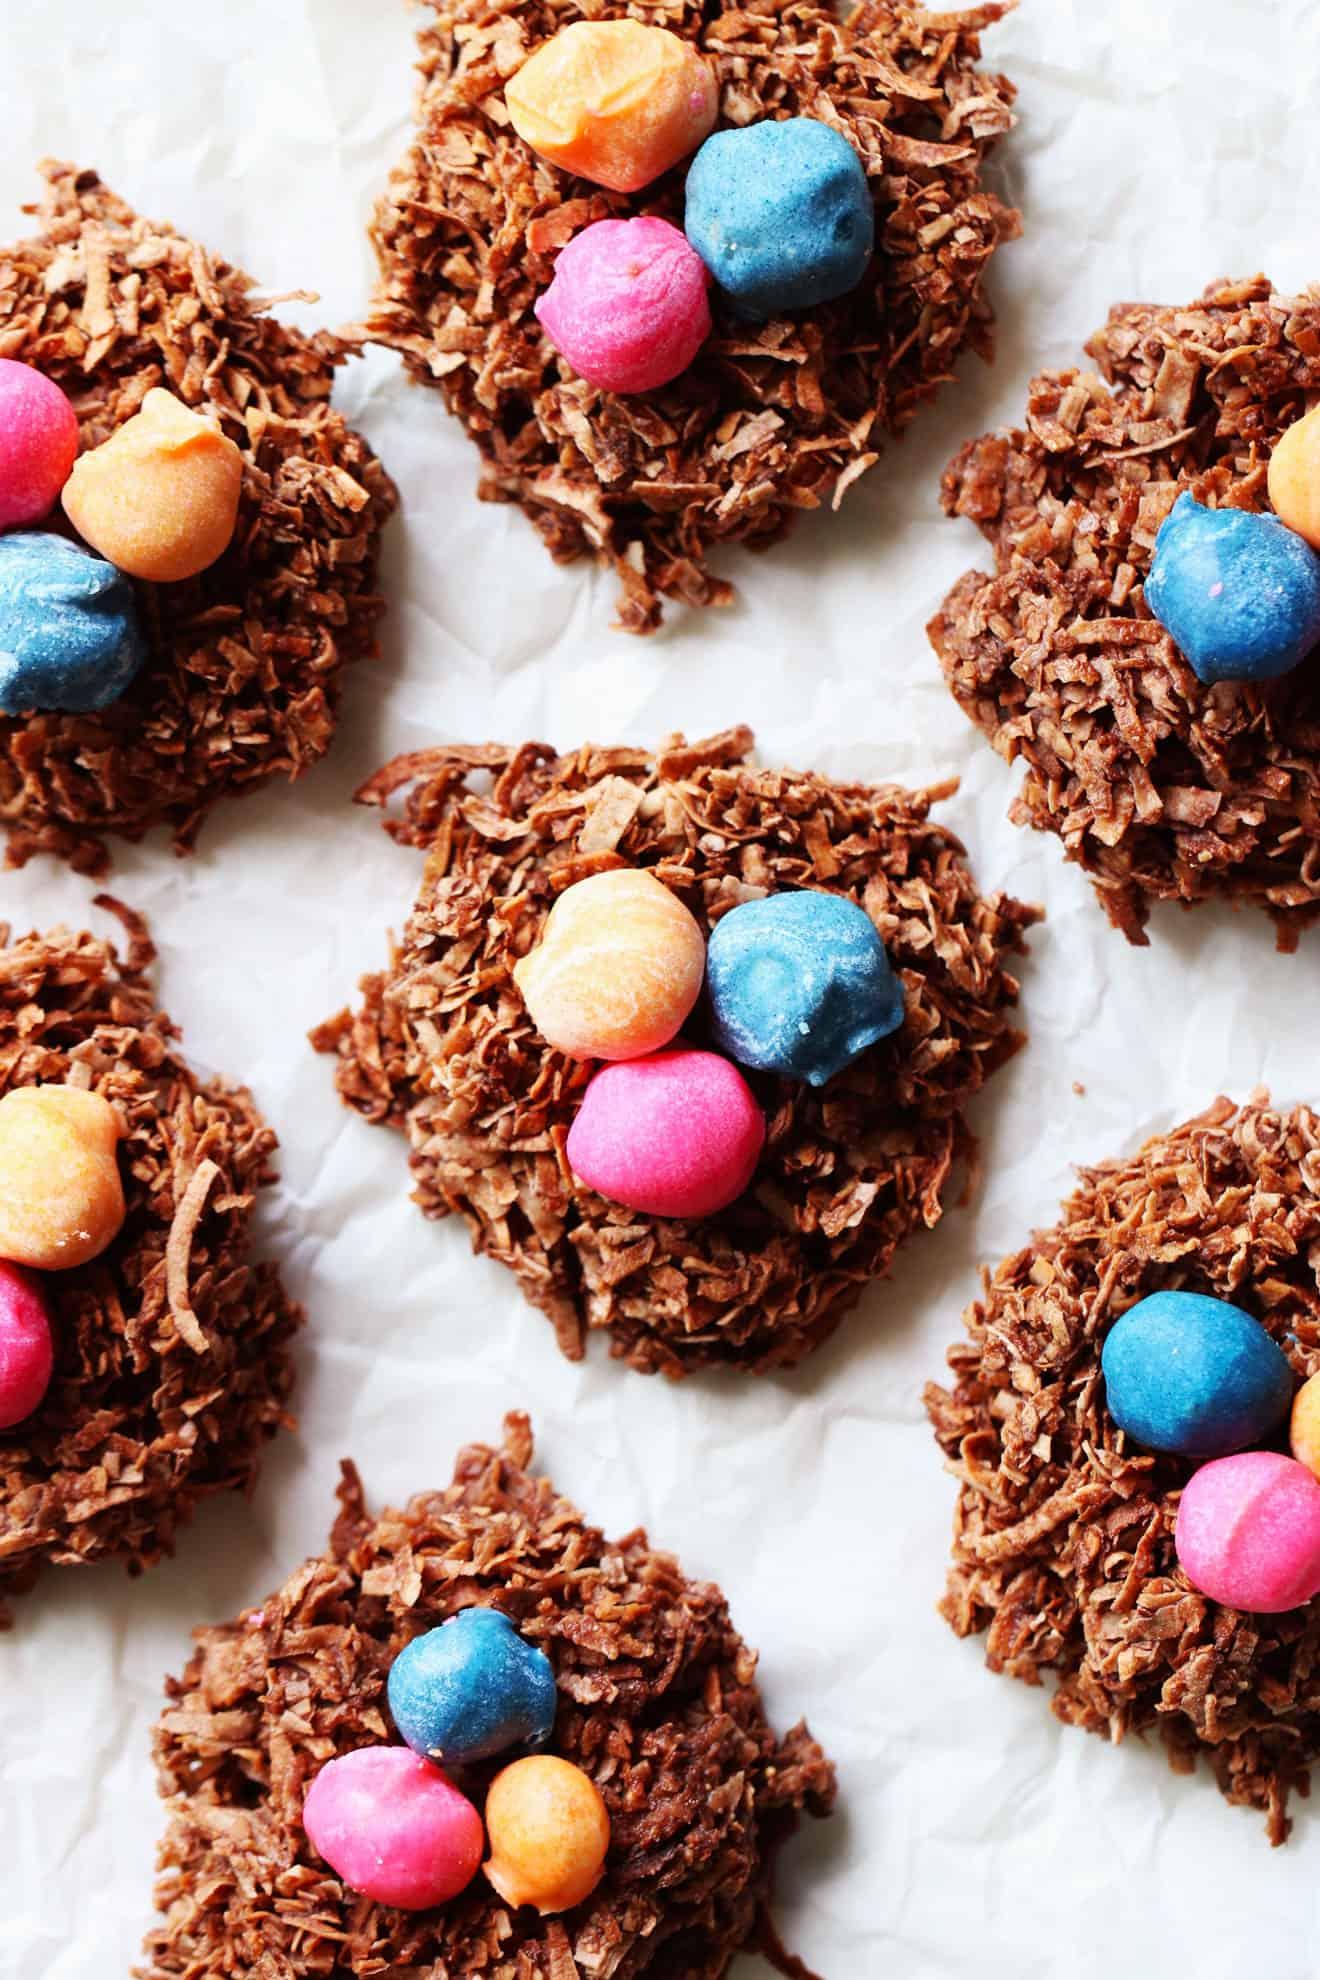 No Bake Chocolate Coconut Nests